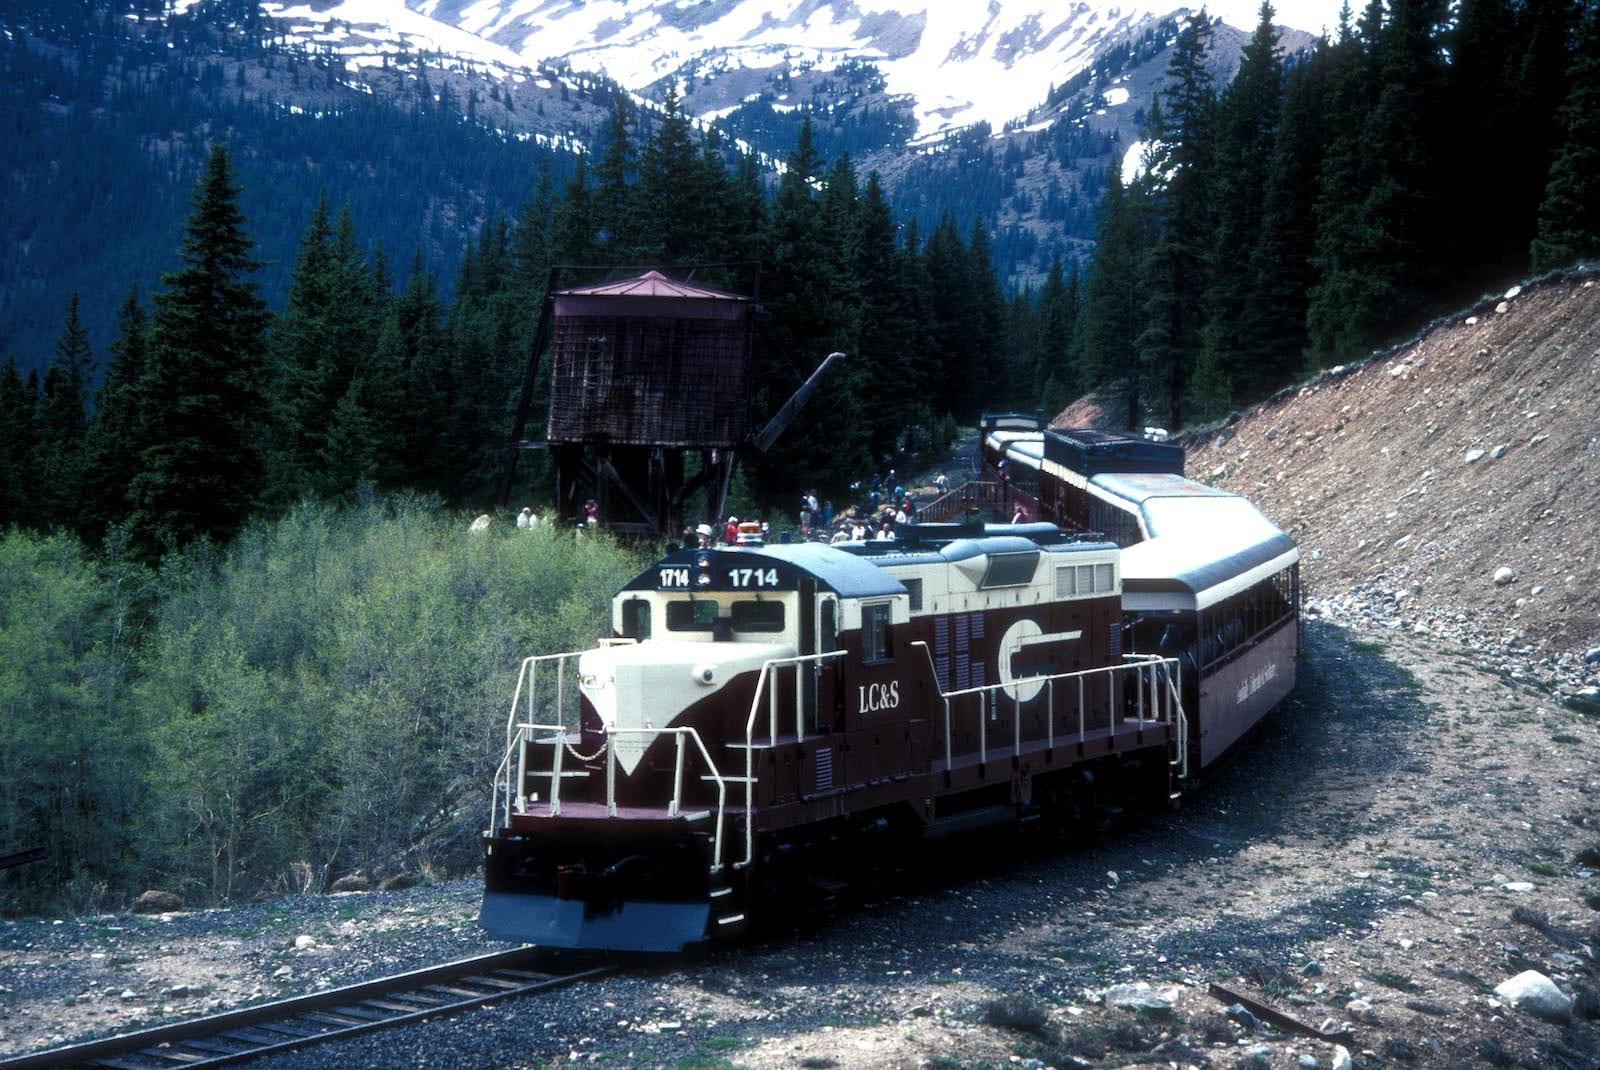 Leadville Colorado and Southern Railroad Train